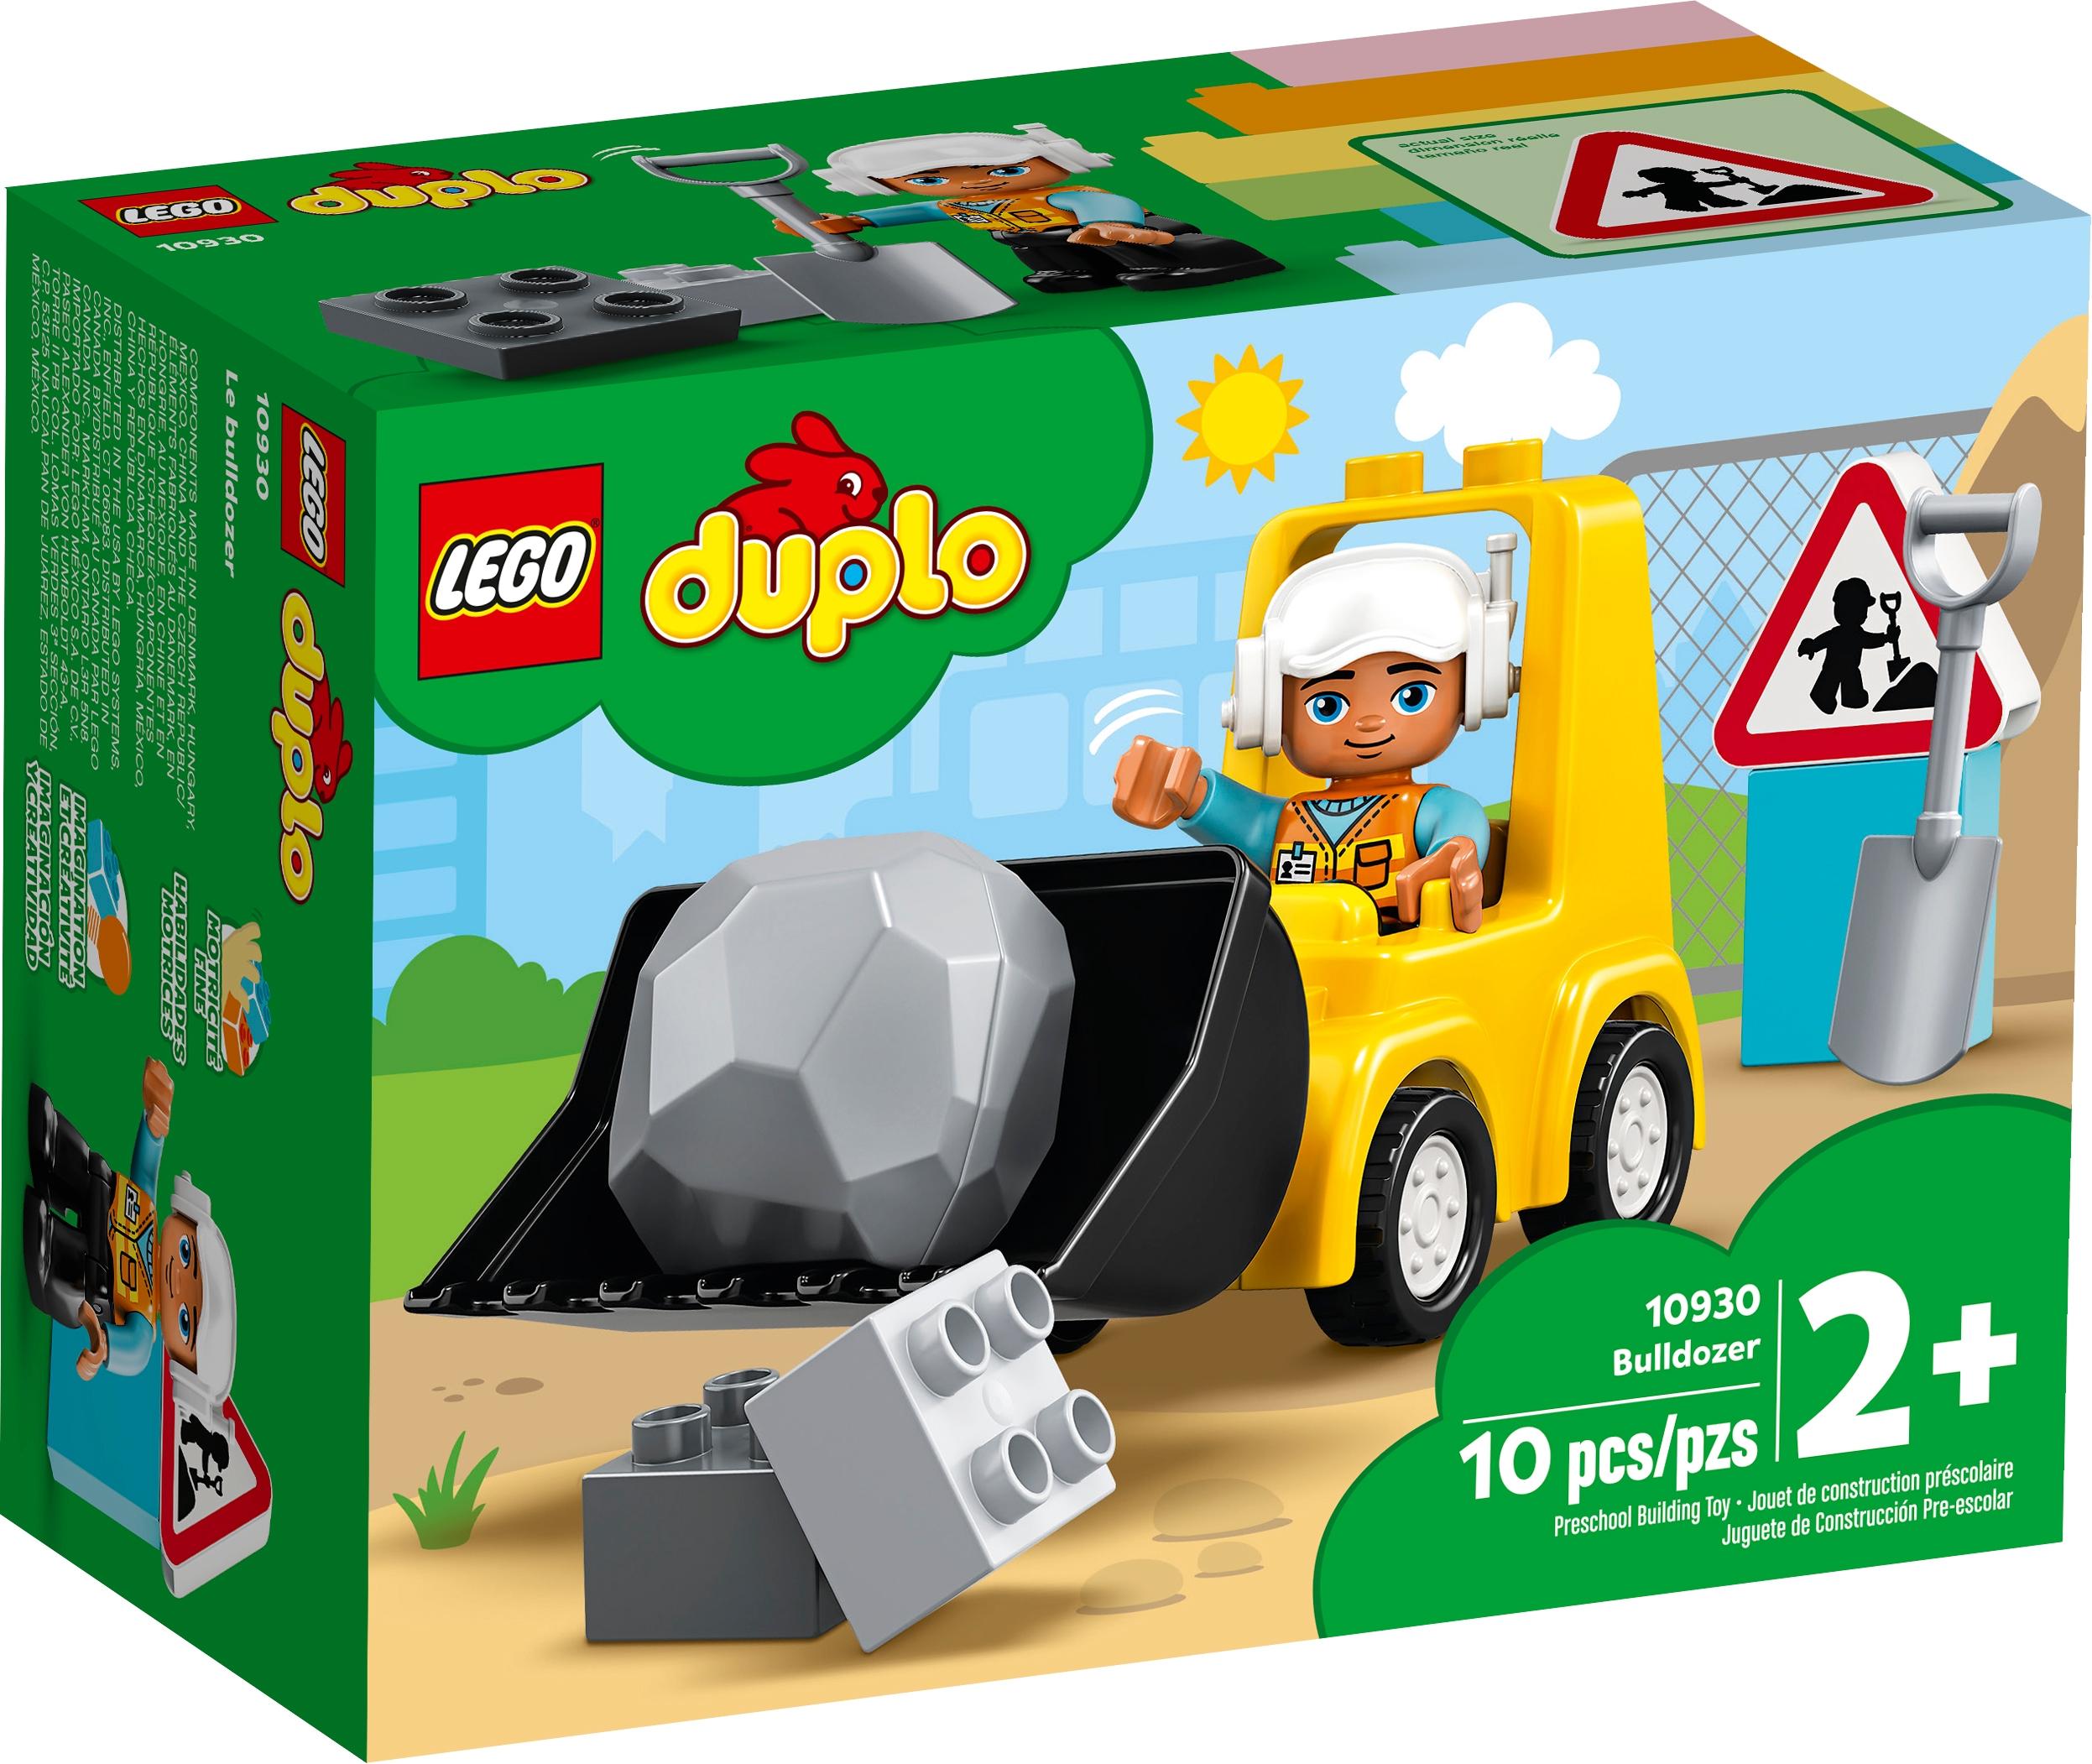 LEGO DUPLO 10930 Bulldozer ~ NEW ~